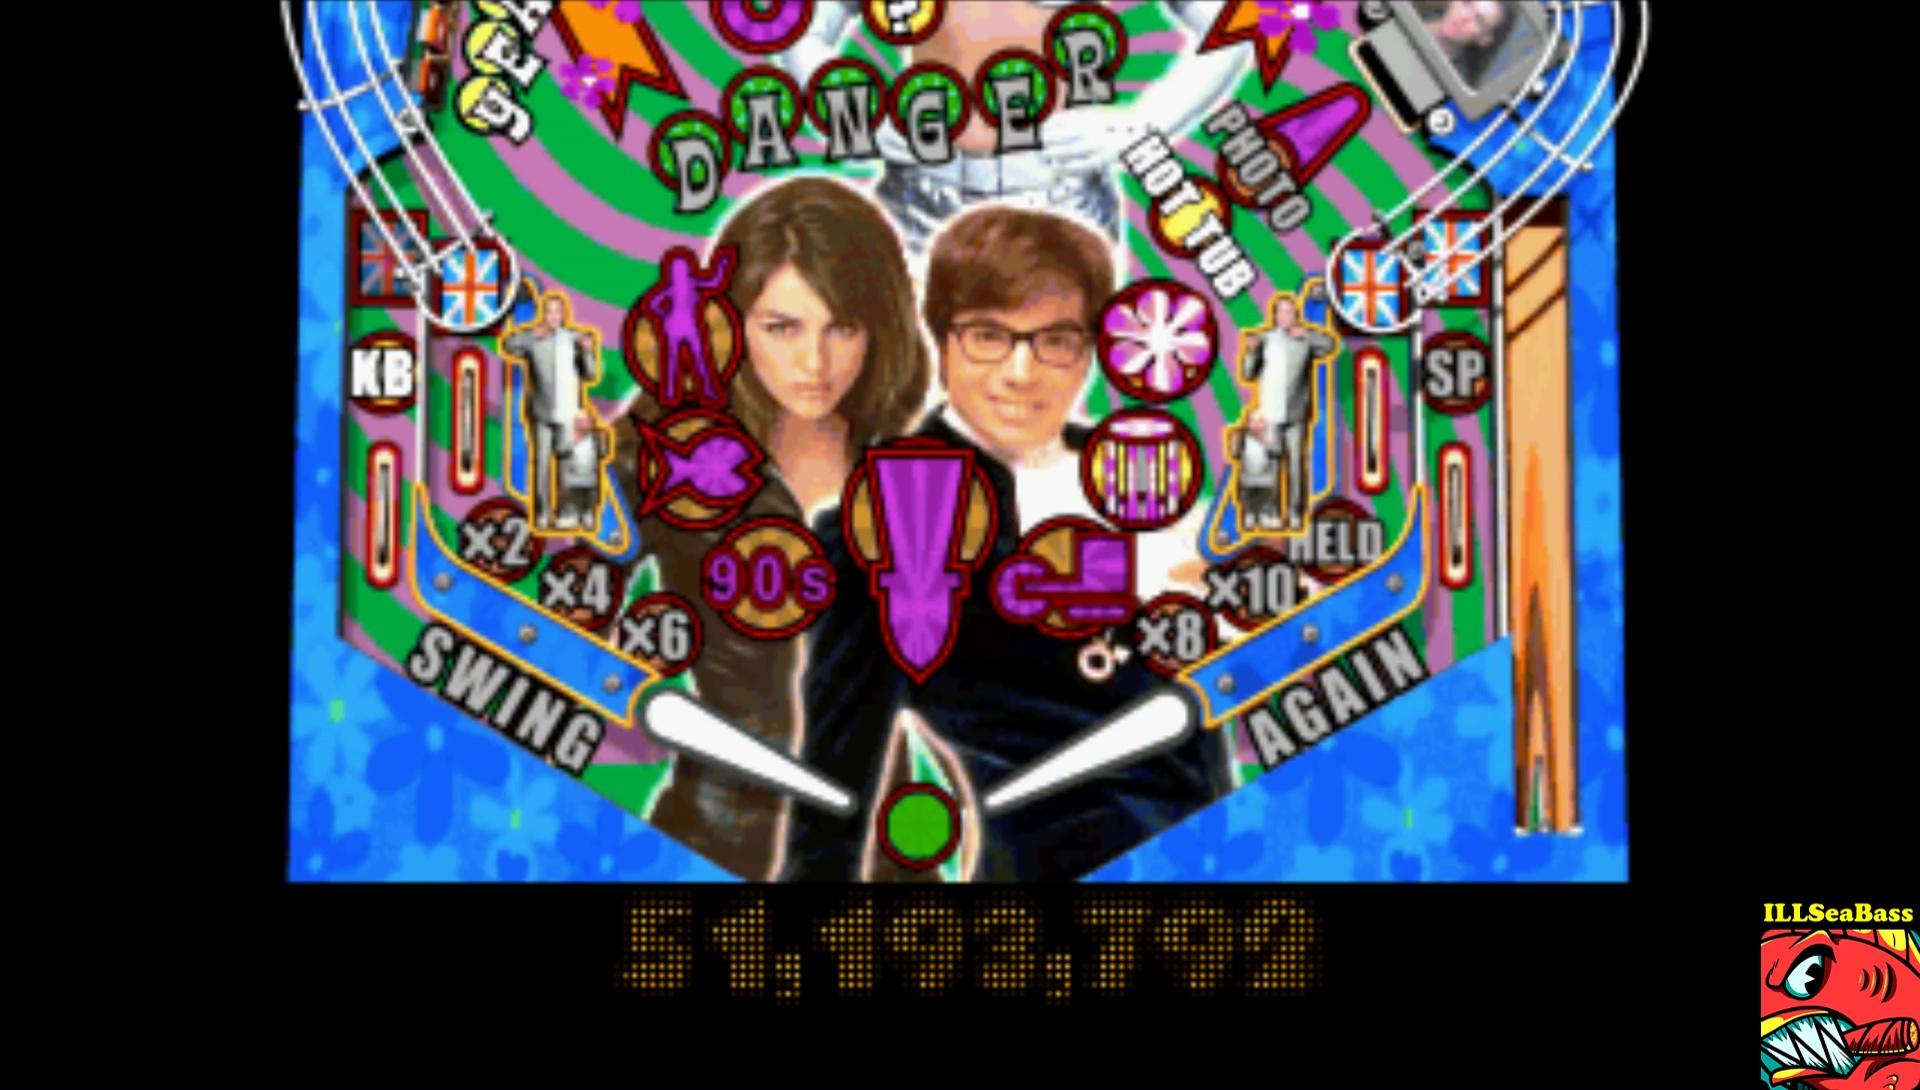 ILLSeaBass: Austin Powers Pinball: International Man Of Mystery [Novice] (Playstation 1 Emulated) 51,193,792 points on 2017-02-18 15:14:39